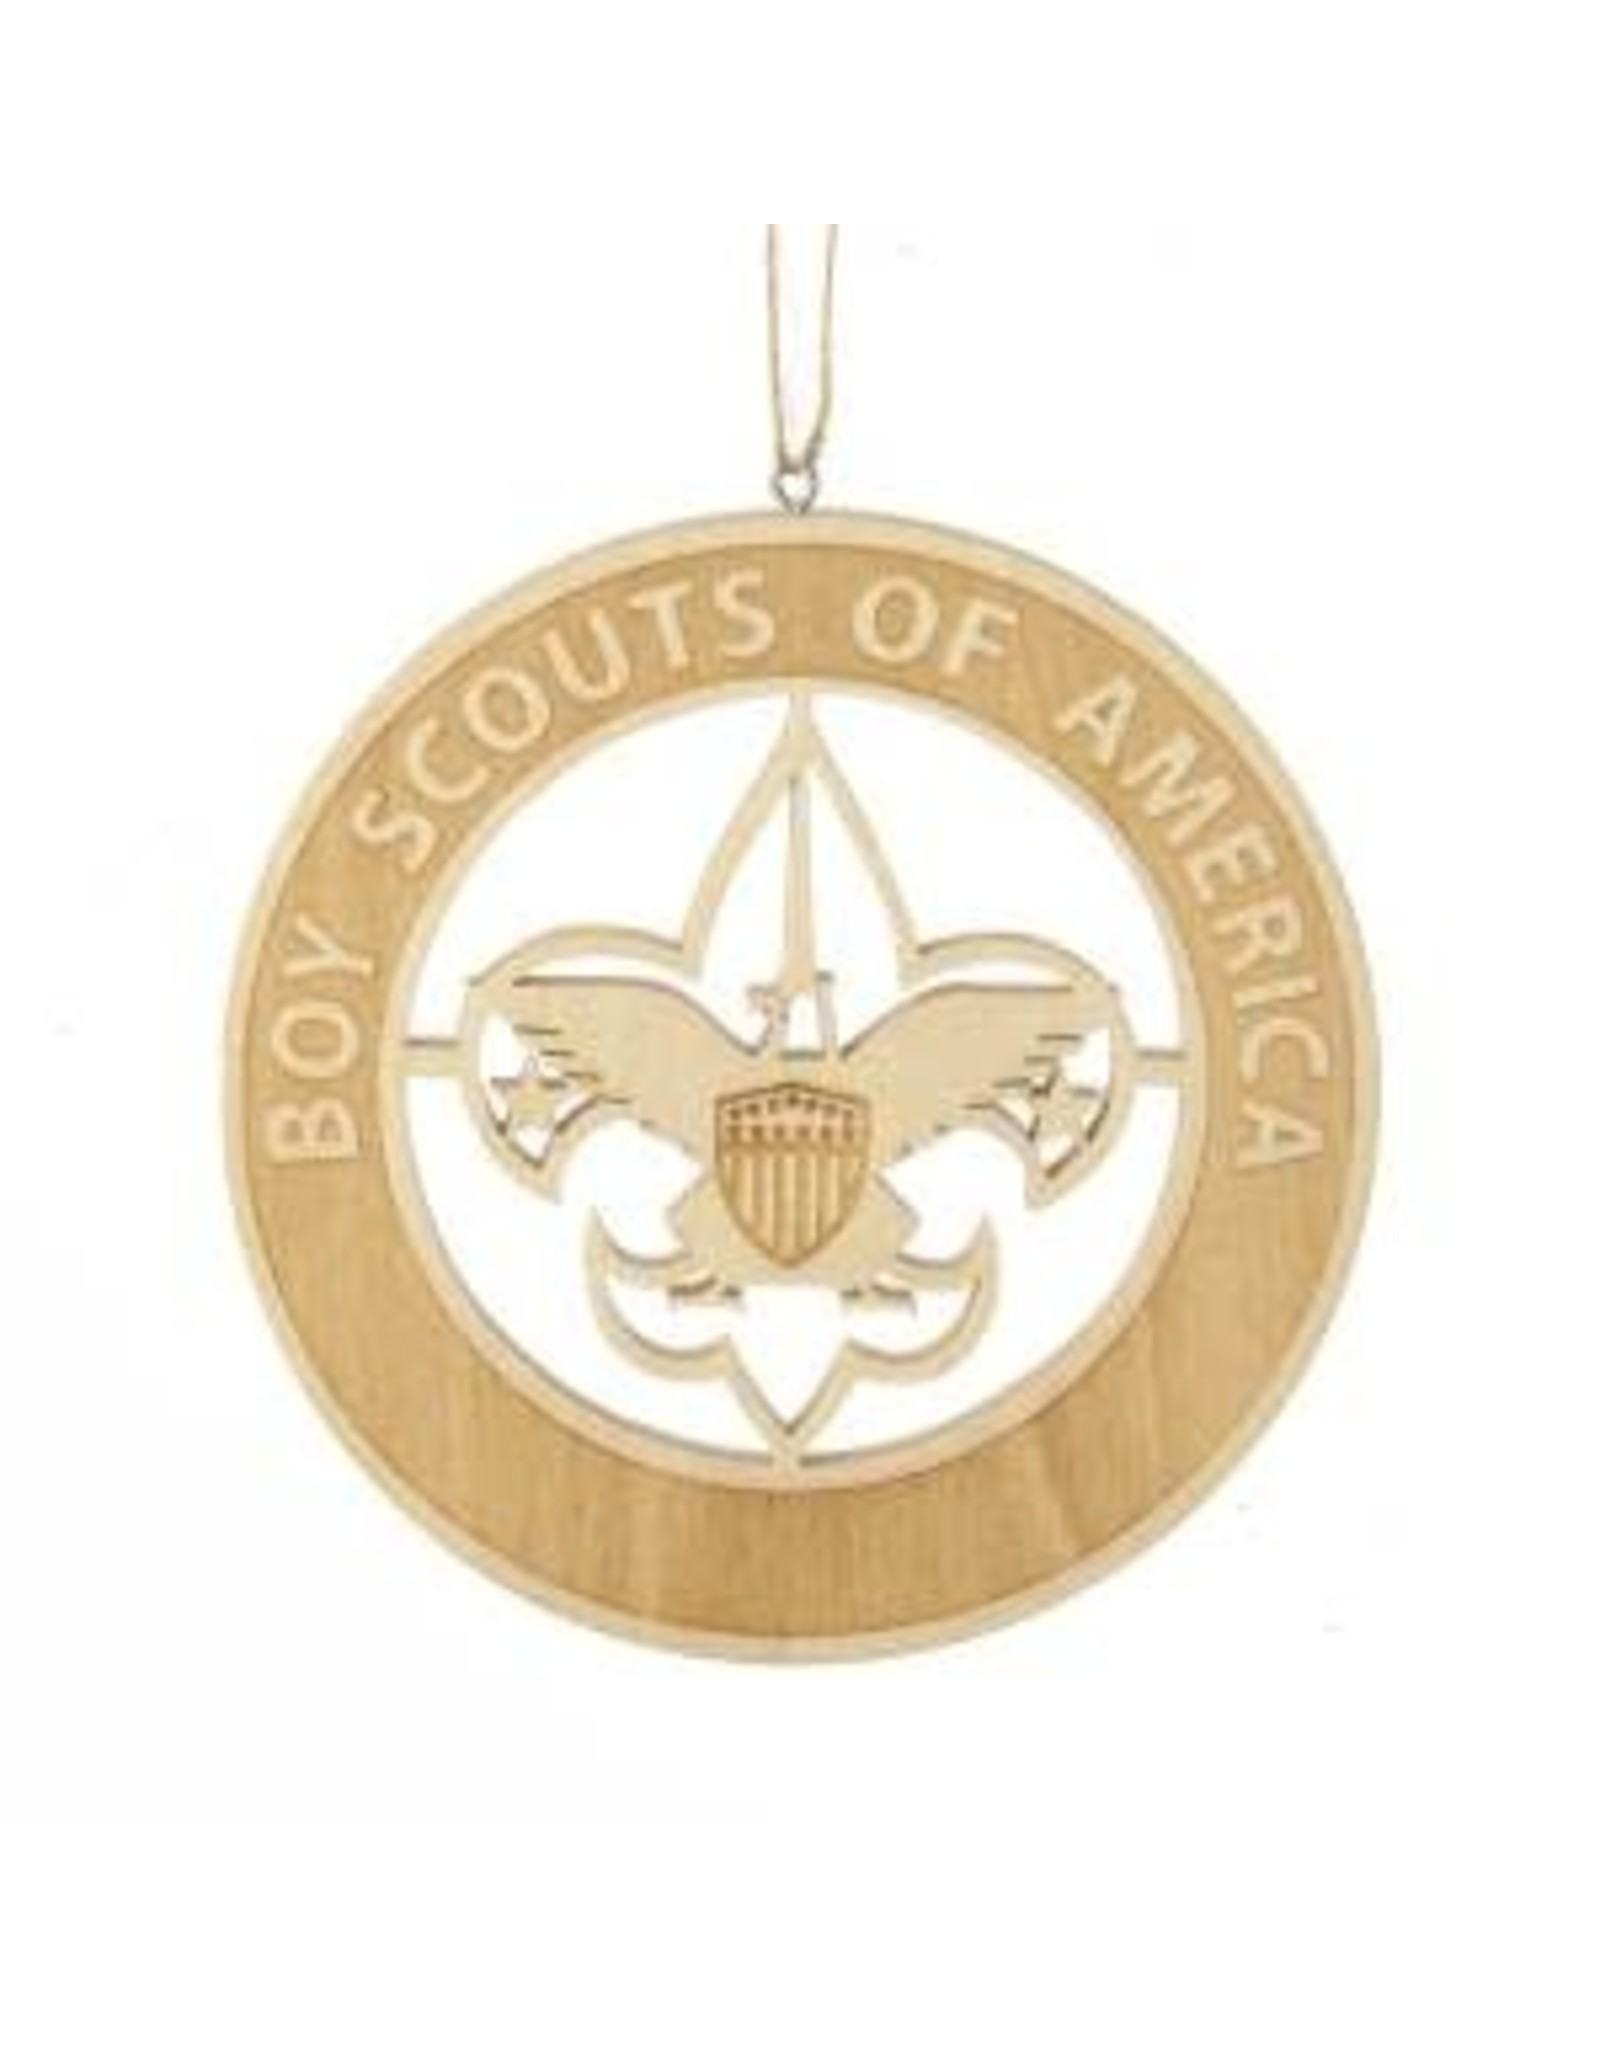 Kurt S. Adler Boy Scouts Ornament